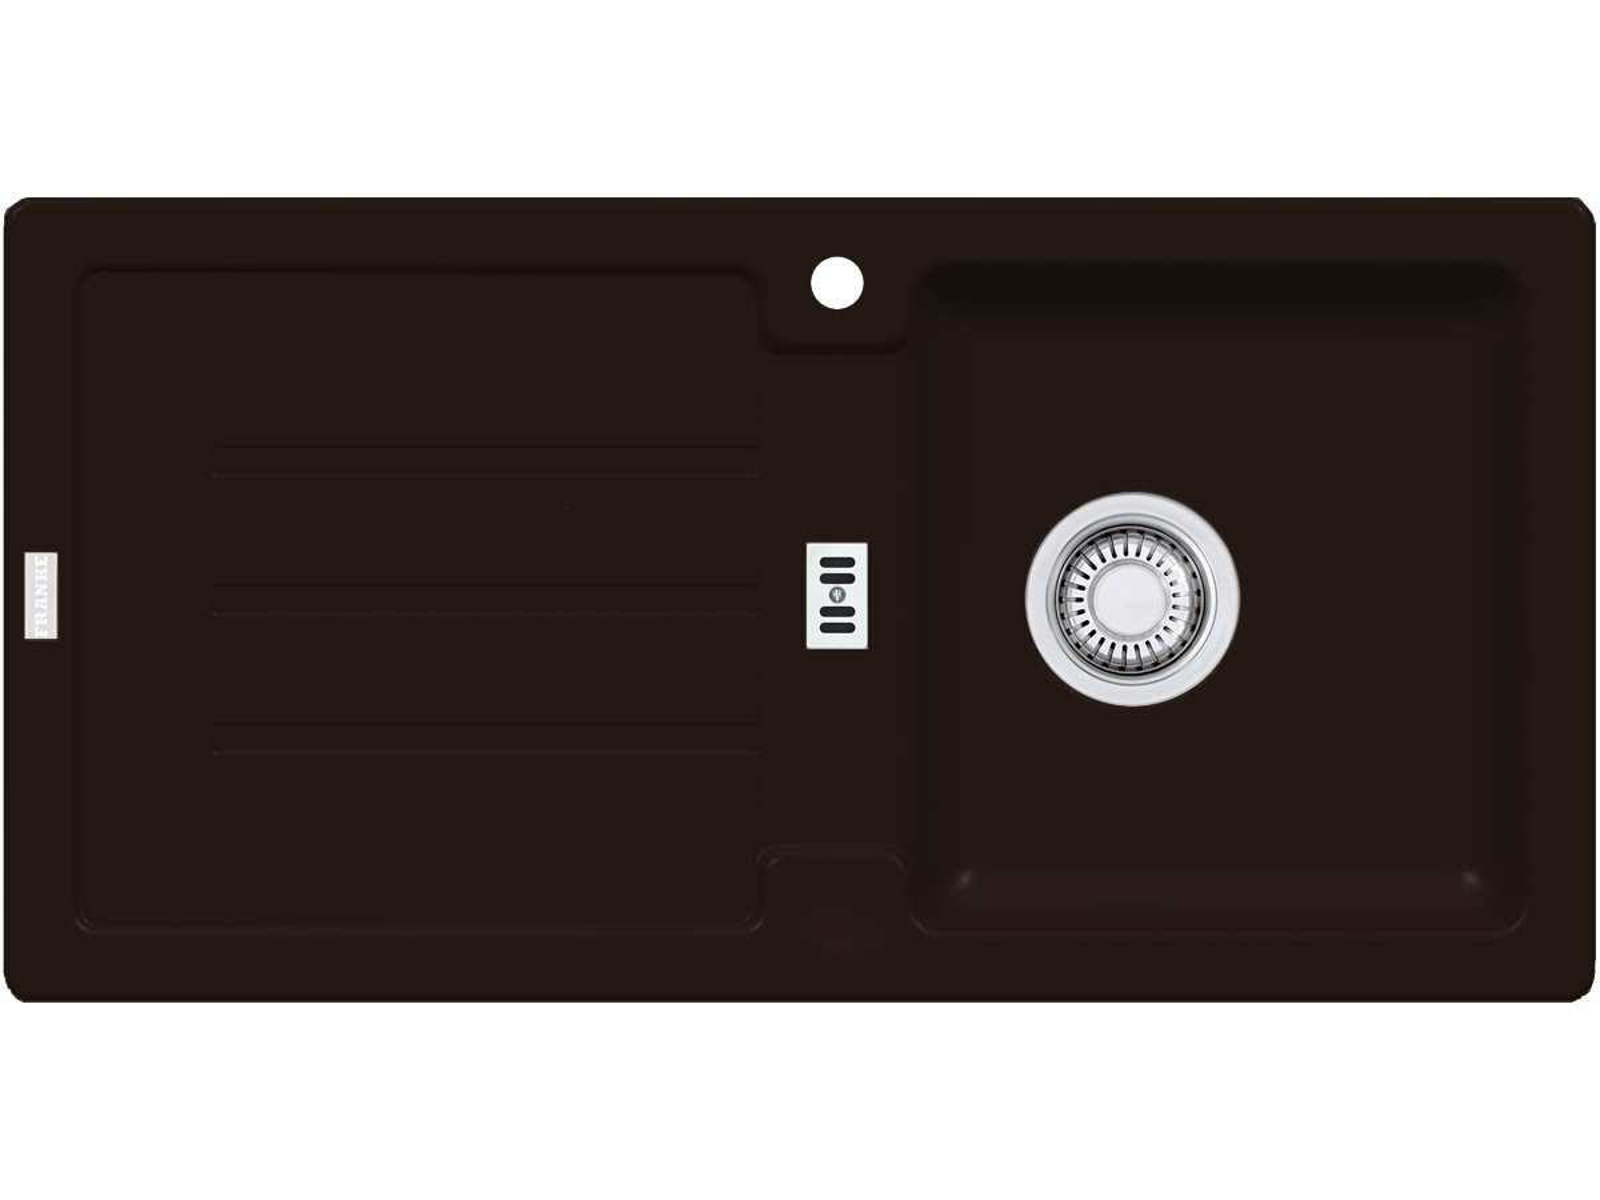 Franke Strata STG 614 Chocolate Granitspüle Stopfenventil